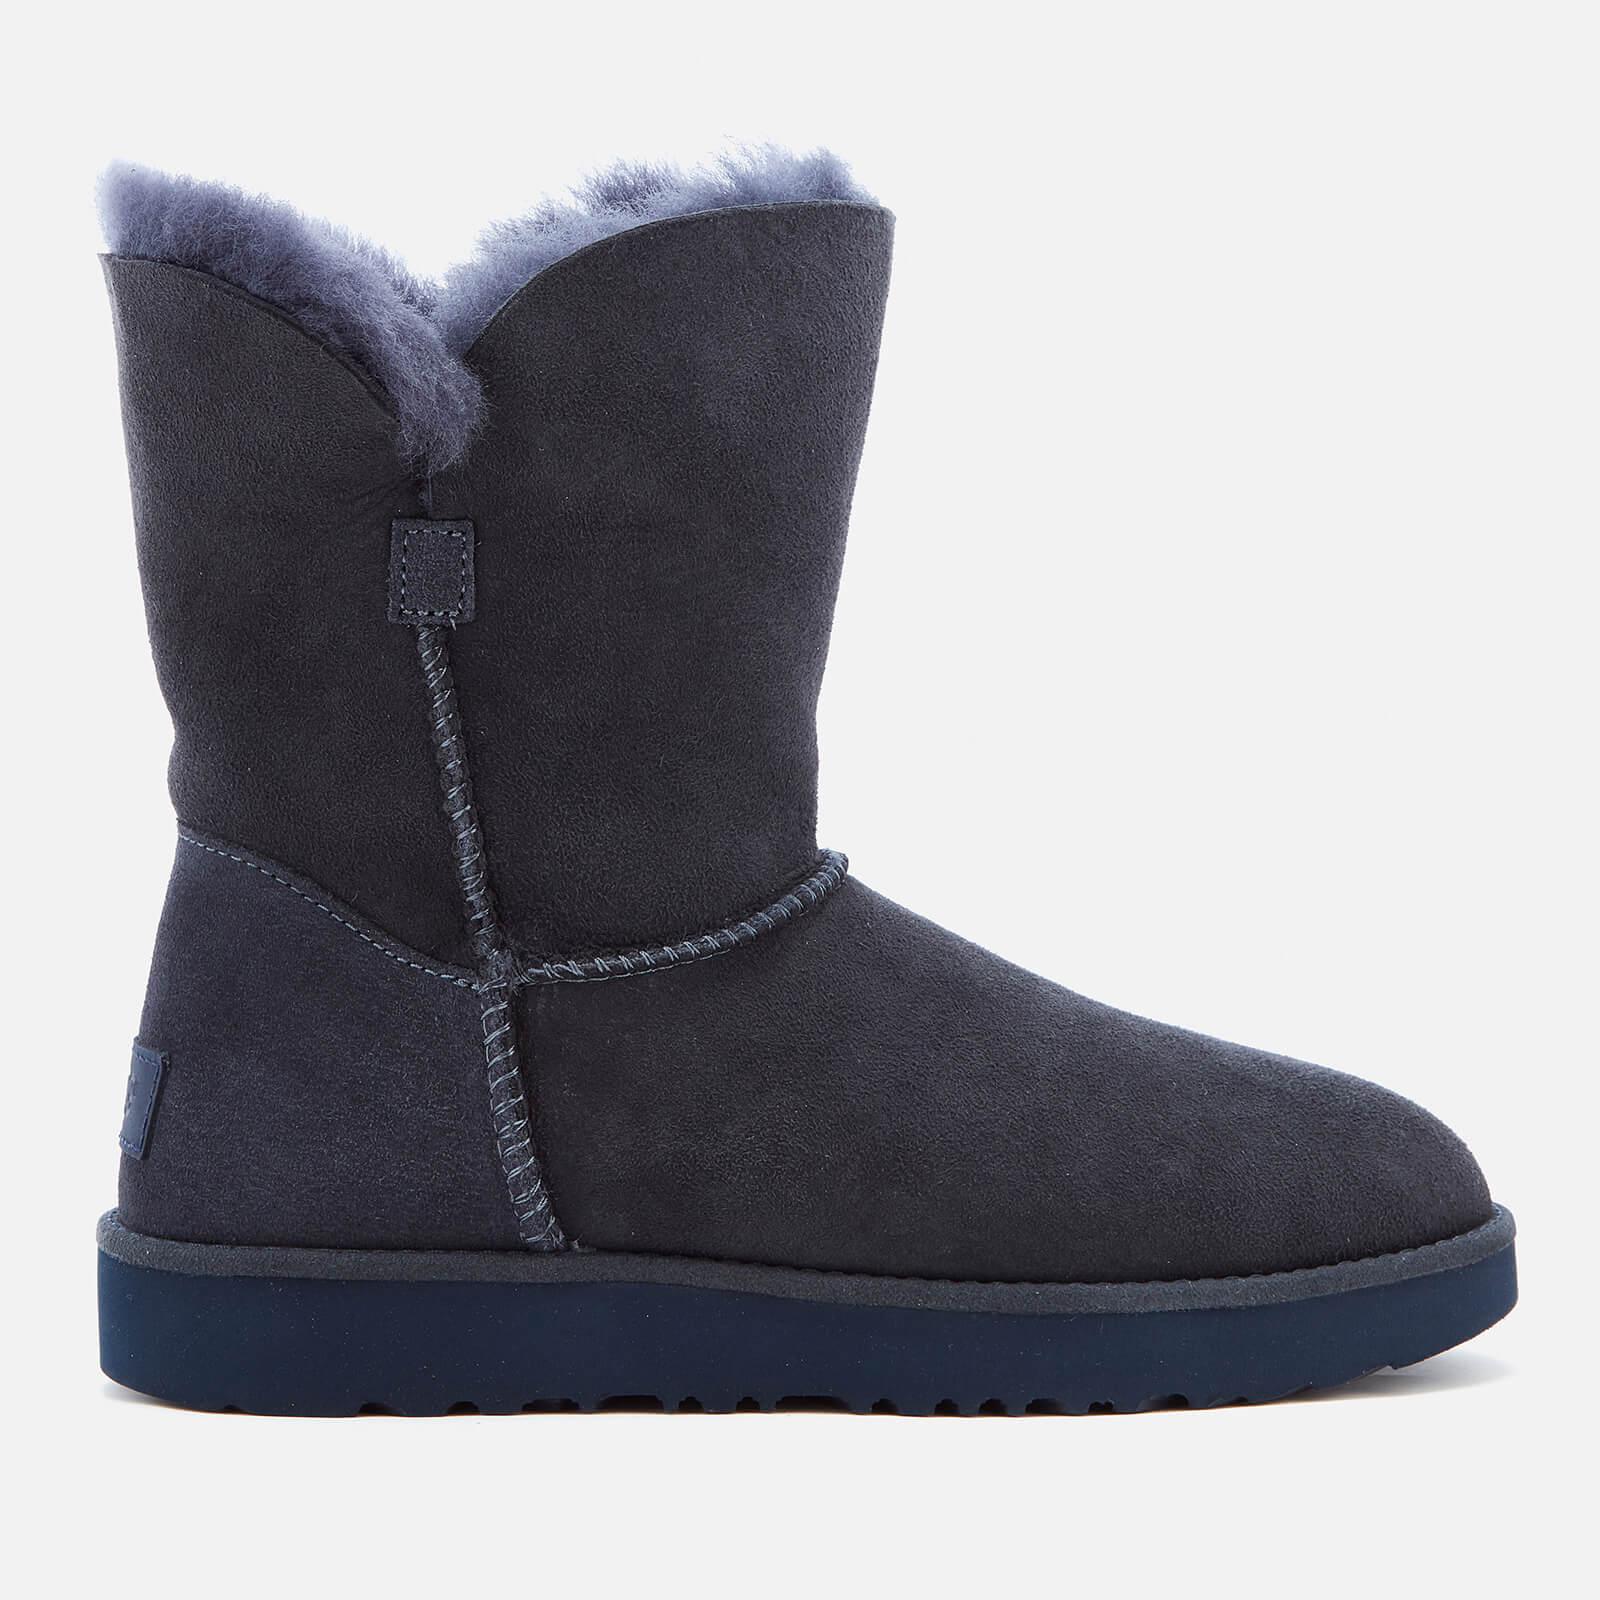 c2ad12ce441 UGG Women's Classic Cuff Short Sheepskin Boots - Imperial